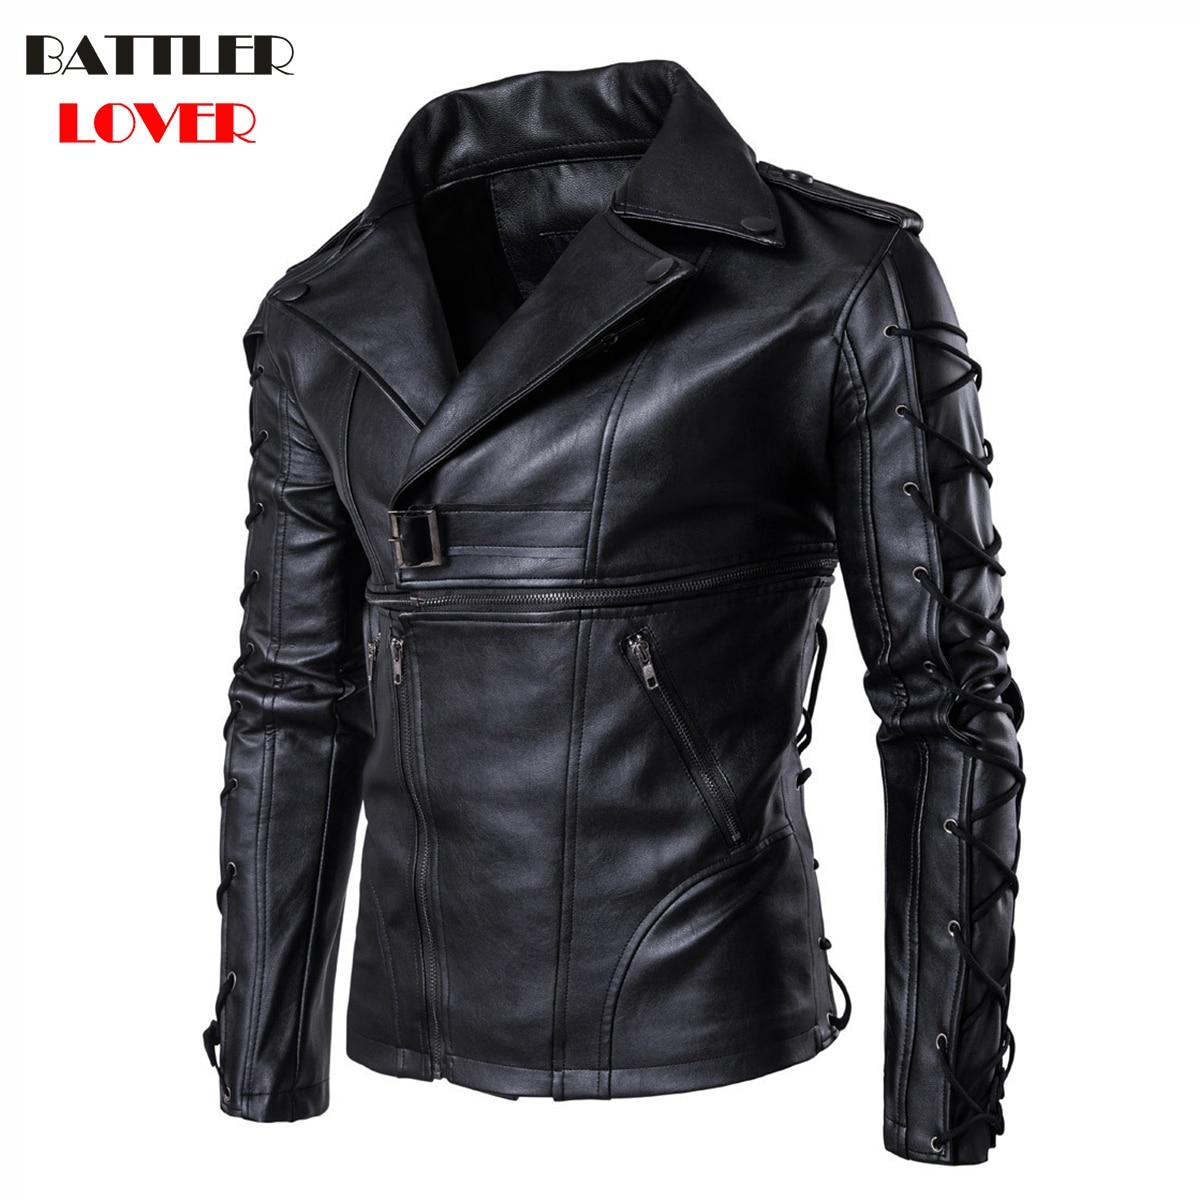 2018 Natual Leather Jackets Mens Bomber Bandage Winter Motorcycle Jacket Men Genuine Leather Windbreaker Motor Biker Hombre Coat